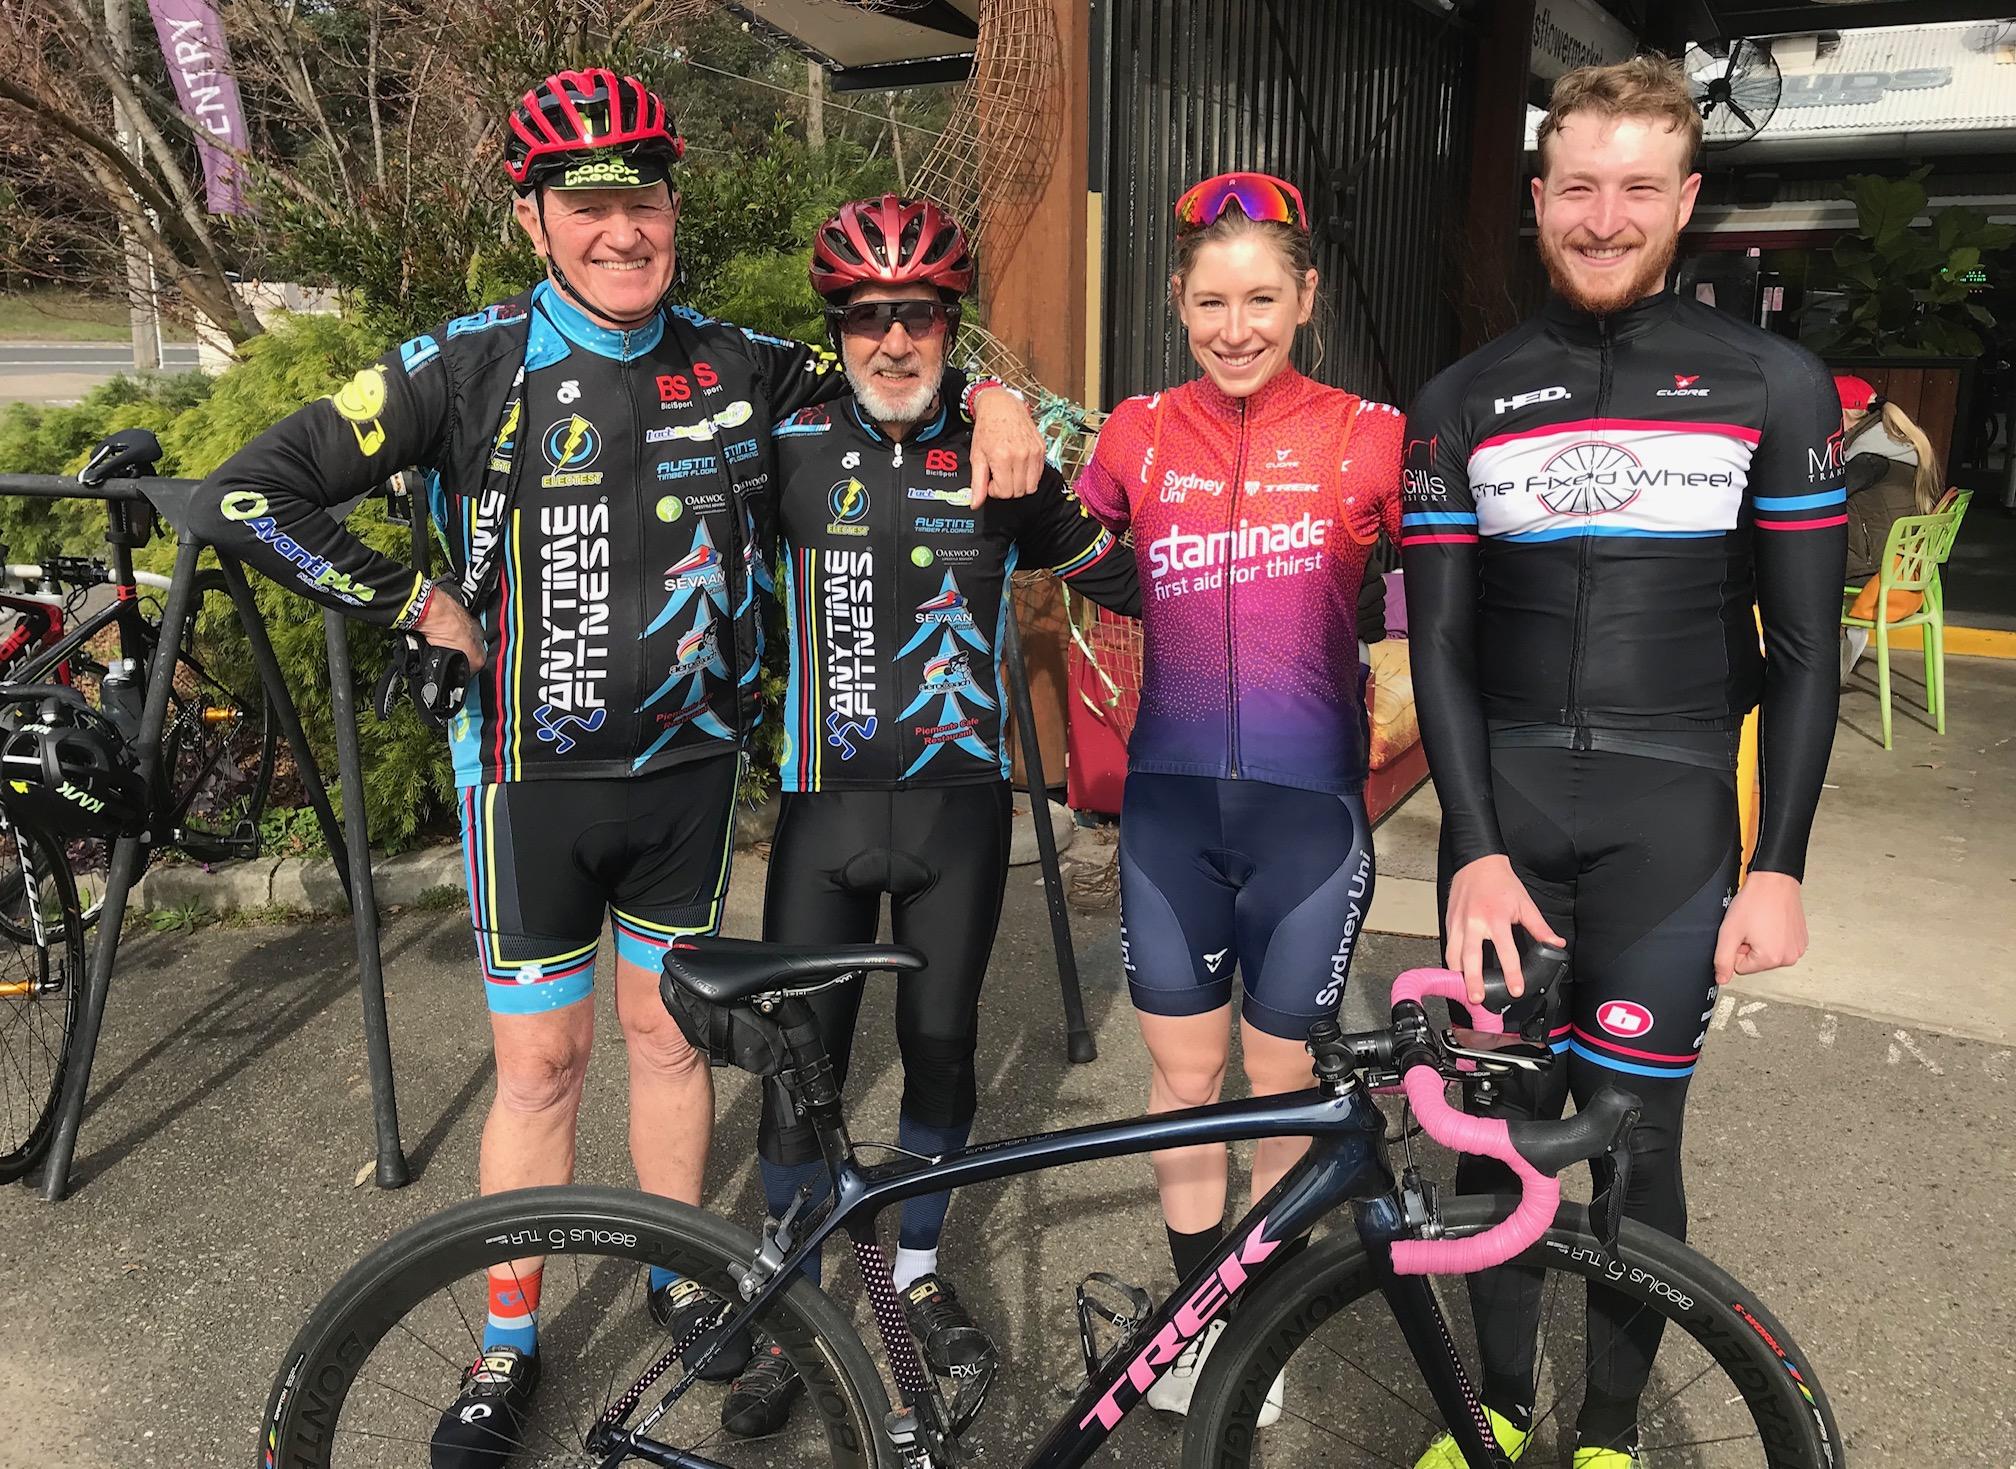 BiciSport @ Hills Nursery Terrey Hills @ 28 June - Peter Davis, Noel La Rose (81 years young), Georgie Whitehouse & Conor Tarlington (BiciSport Happy Wheels)